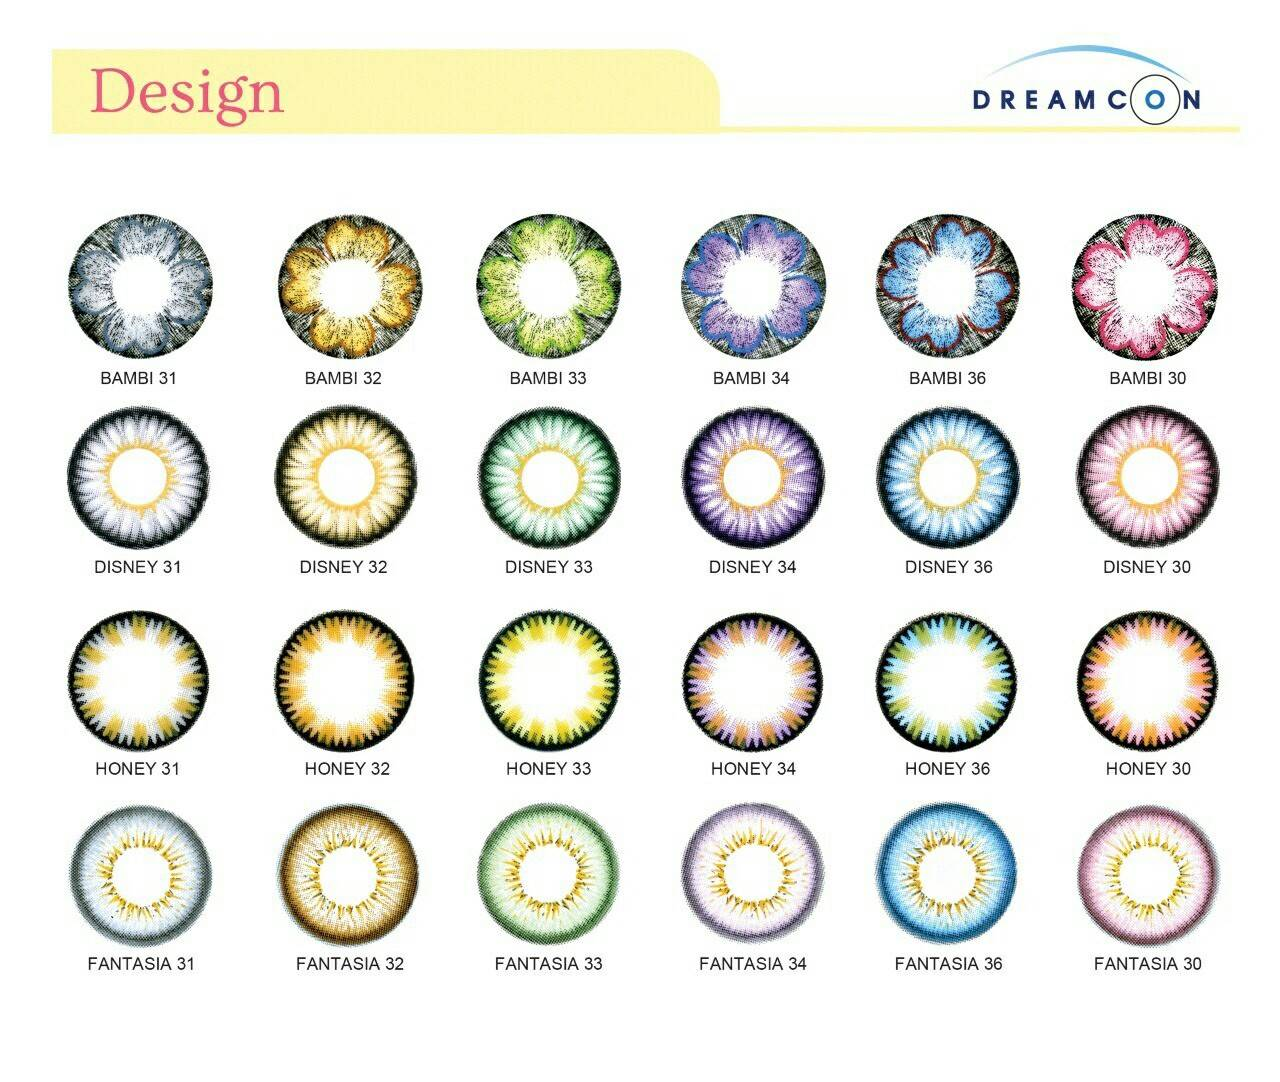 Bambie Violet Dreamcolor1เลนส์นิ่มใส่สบาย คอนแทคเลนส์ ขายส่งคอนแทคเลนส์ ขายส่งBigeye Bigeyeเกาหลี